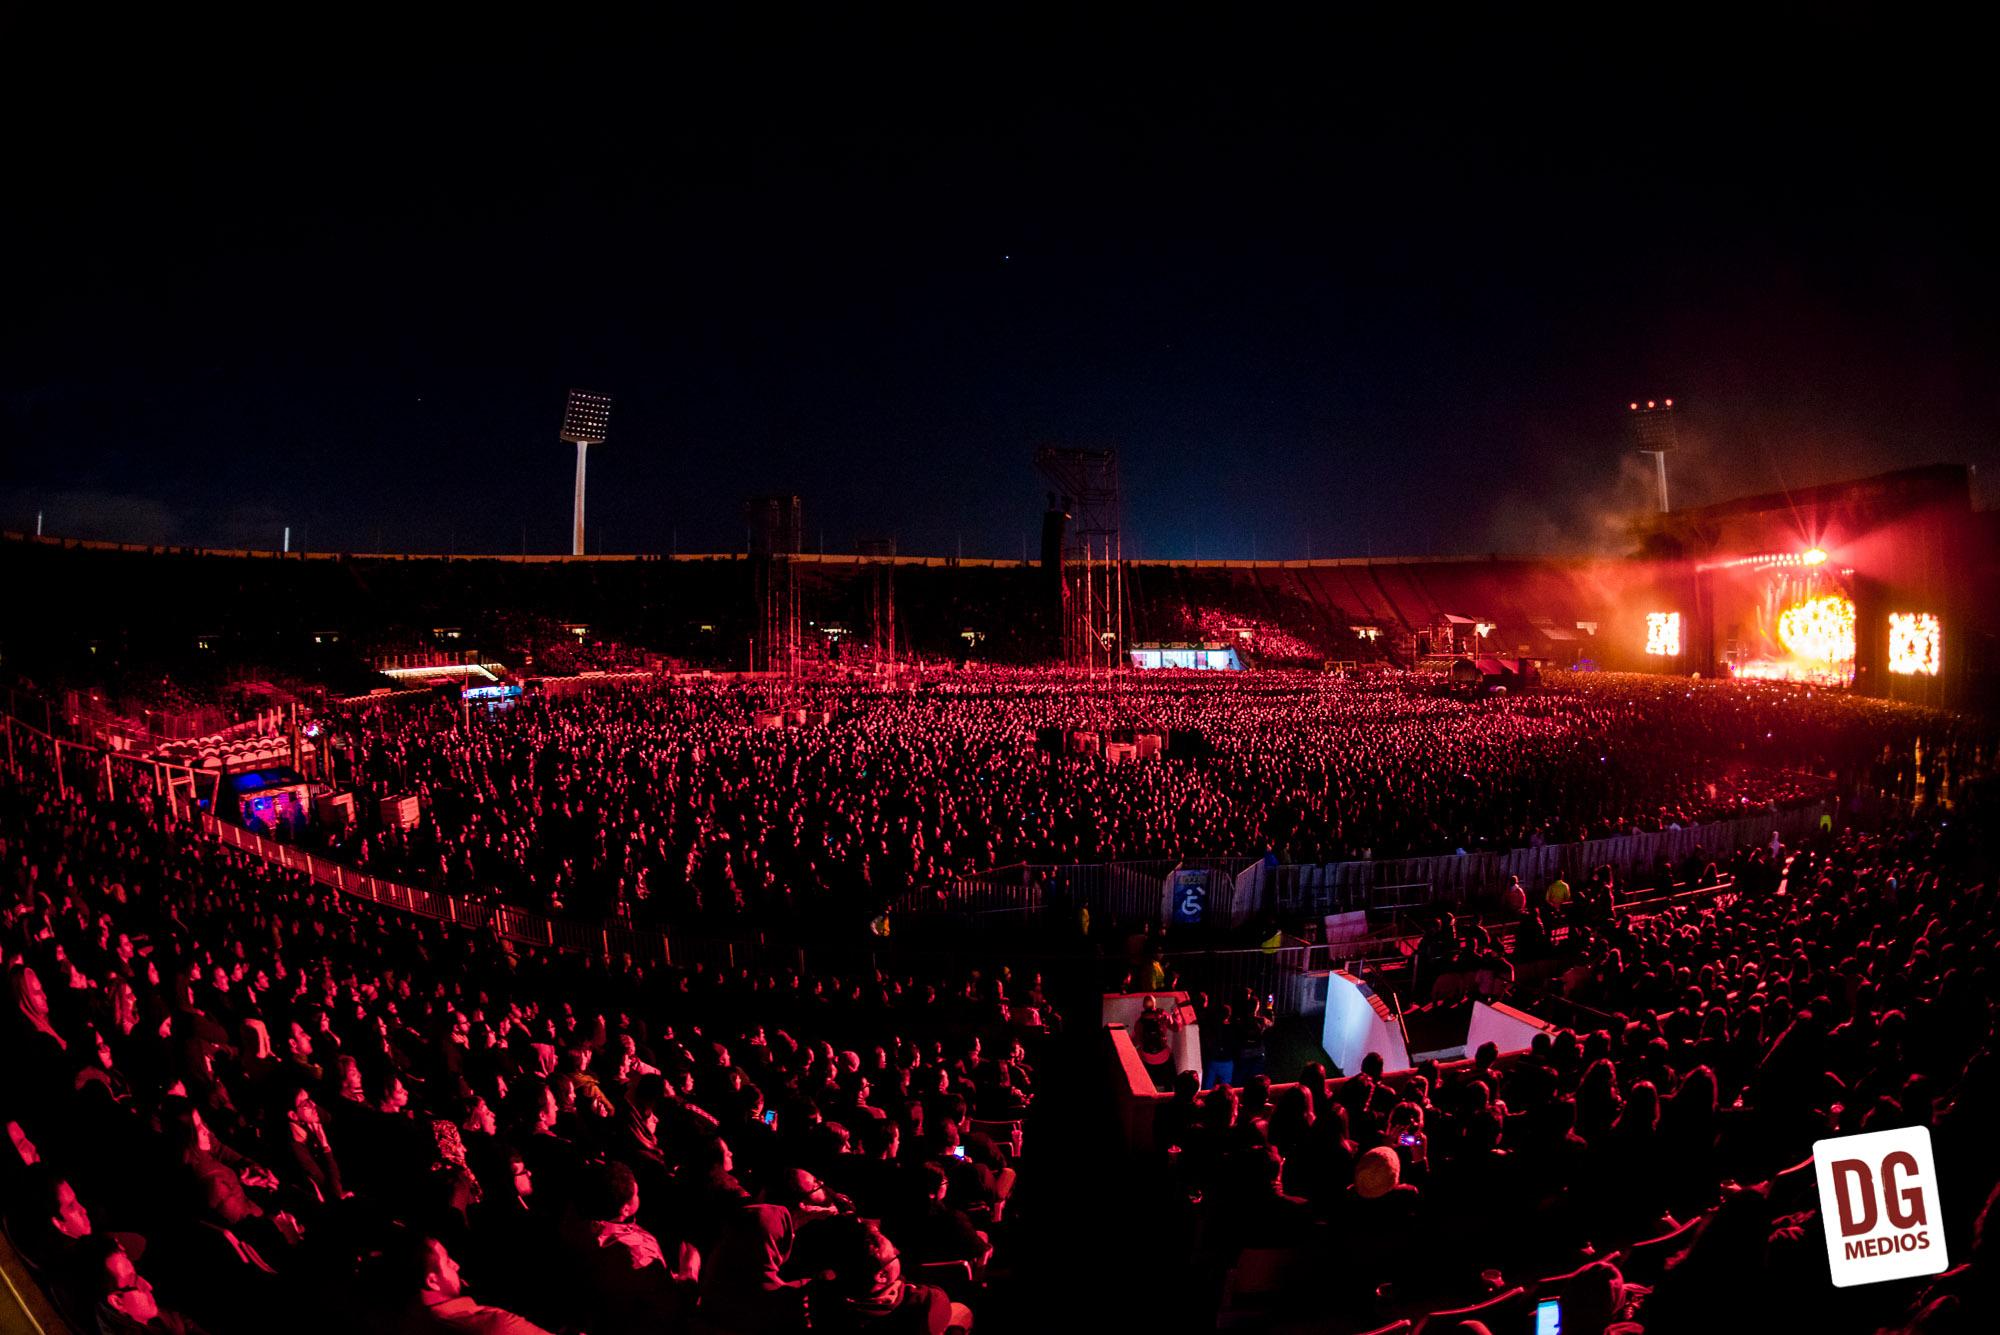 Radiohead | DG Medios | Jaime Vlenzuela